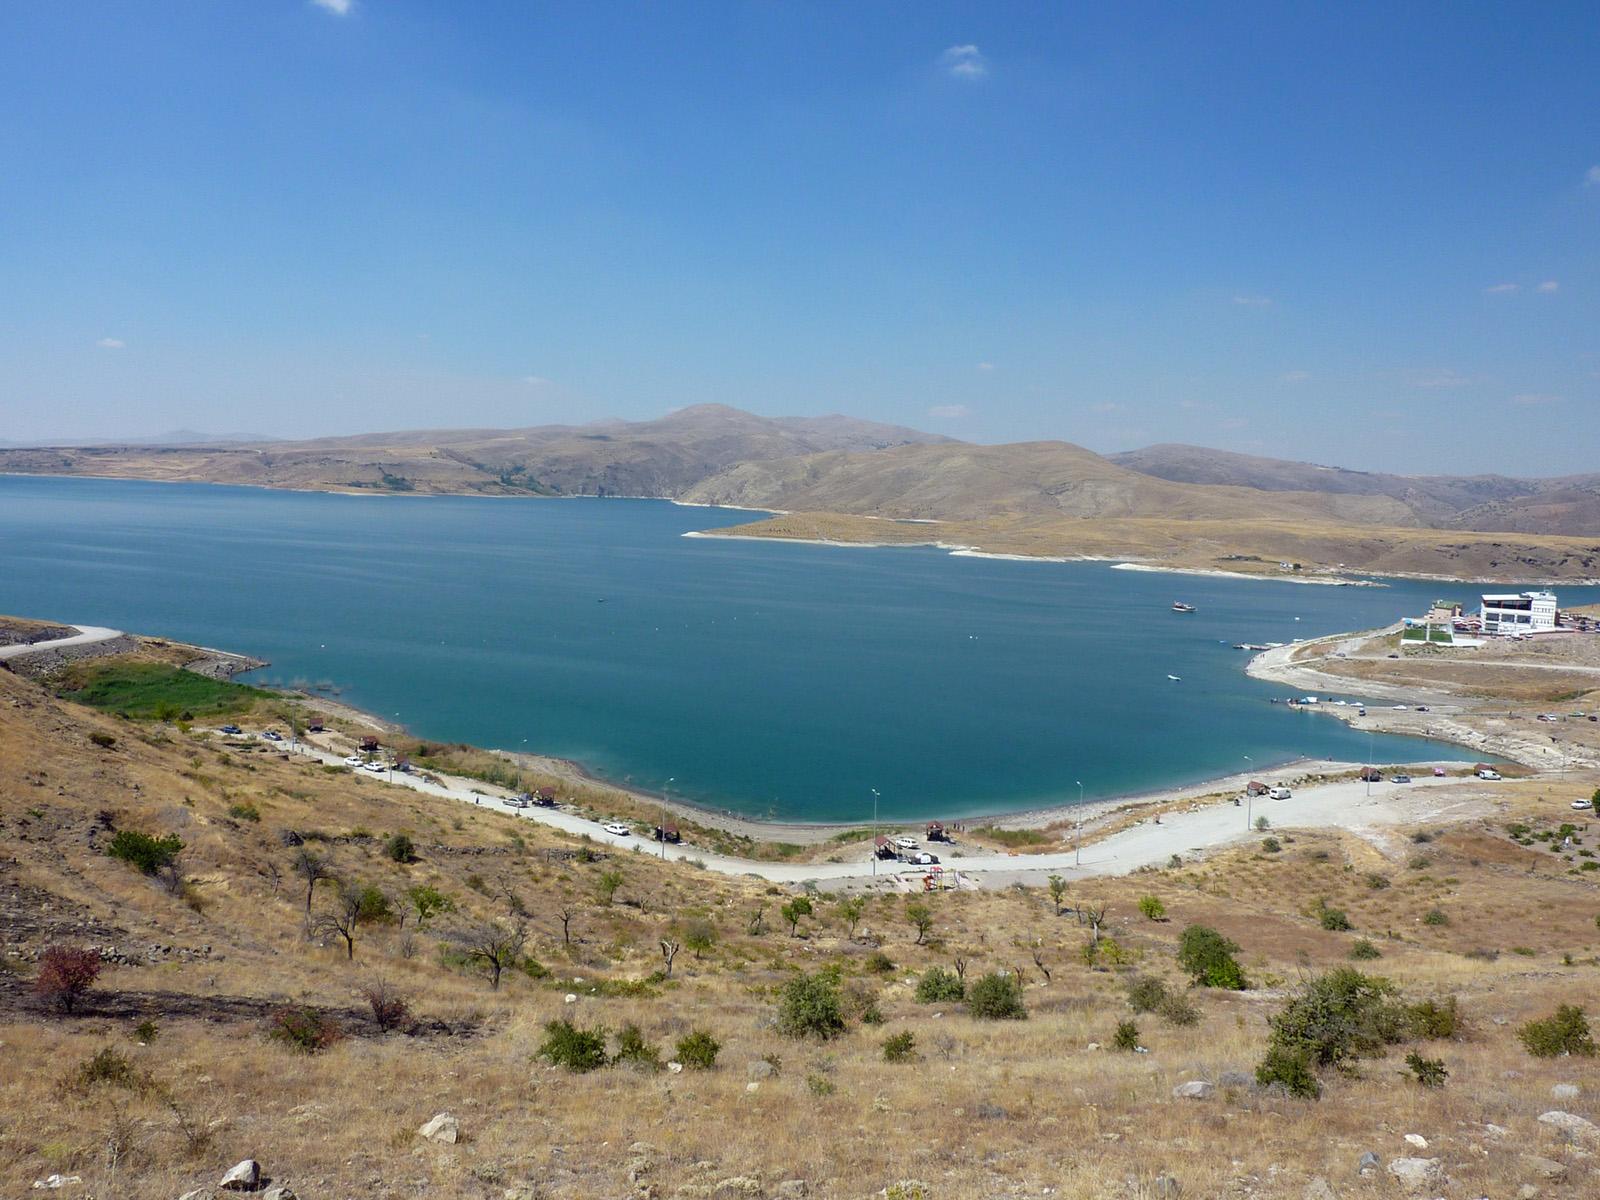 Yamula Dam Lake in Turkey's Kayseri district